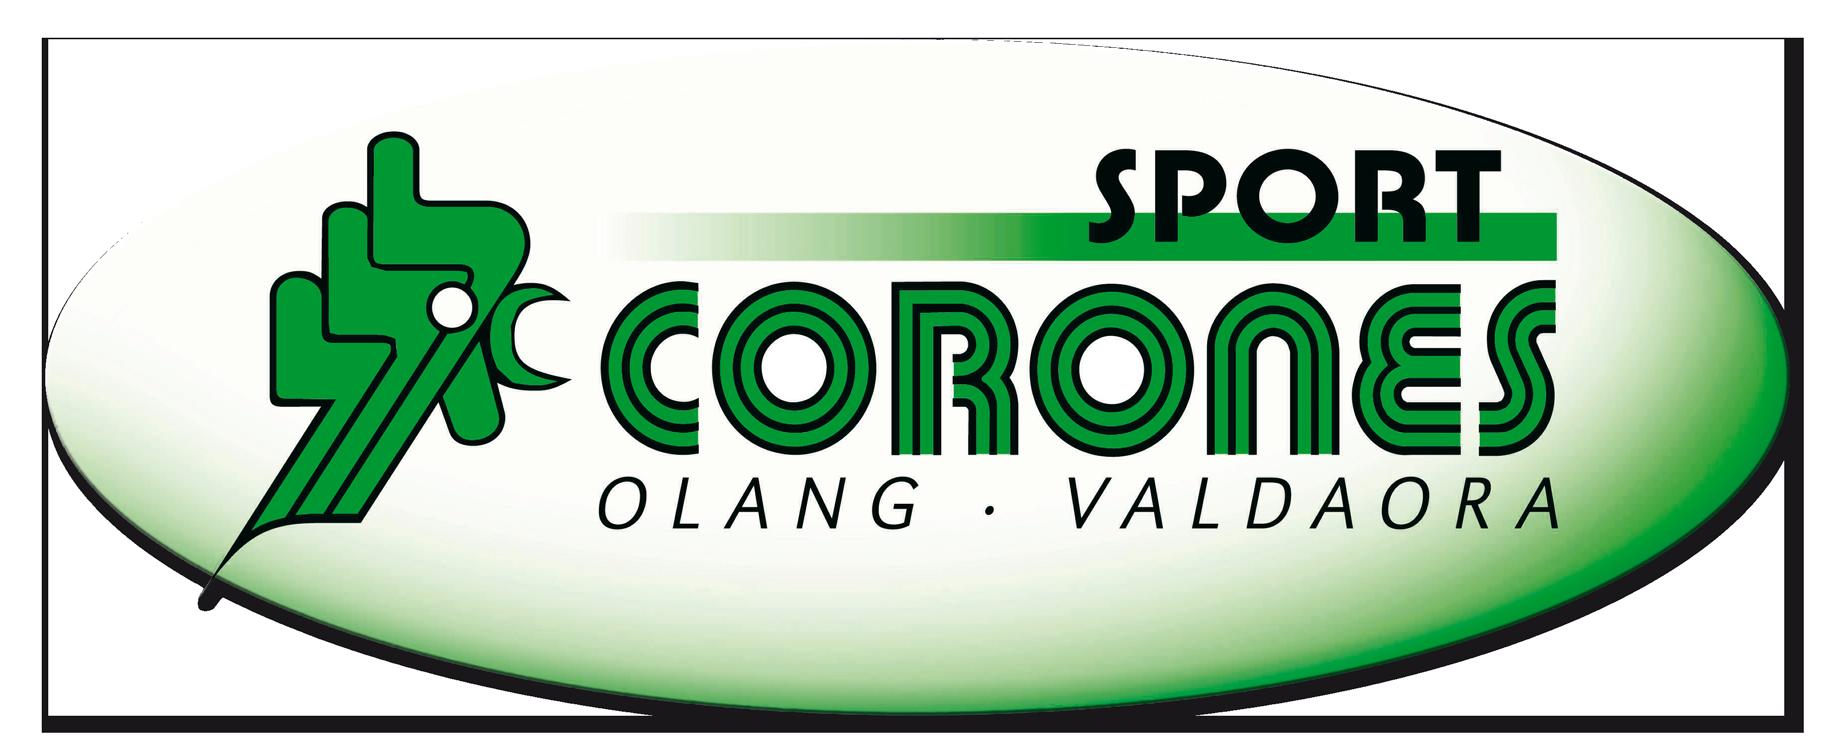 Sport Corones